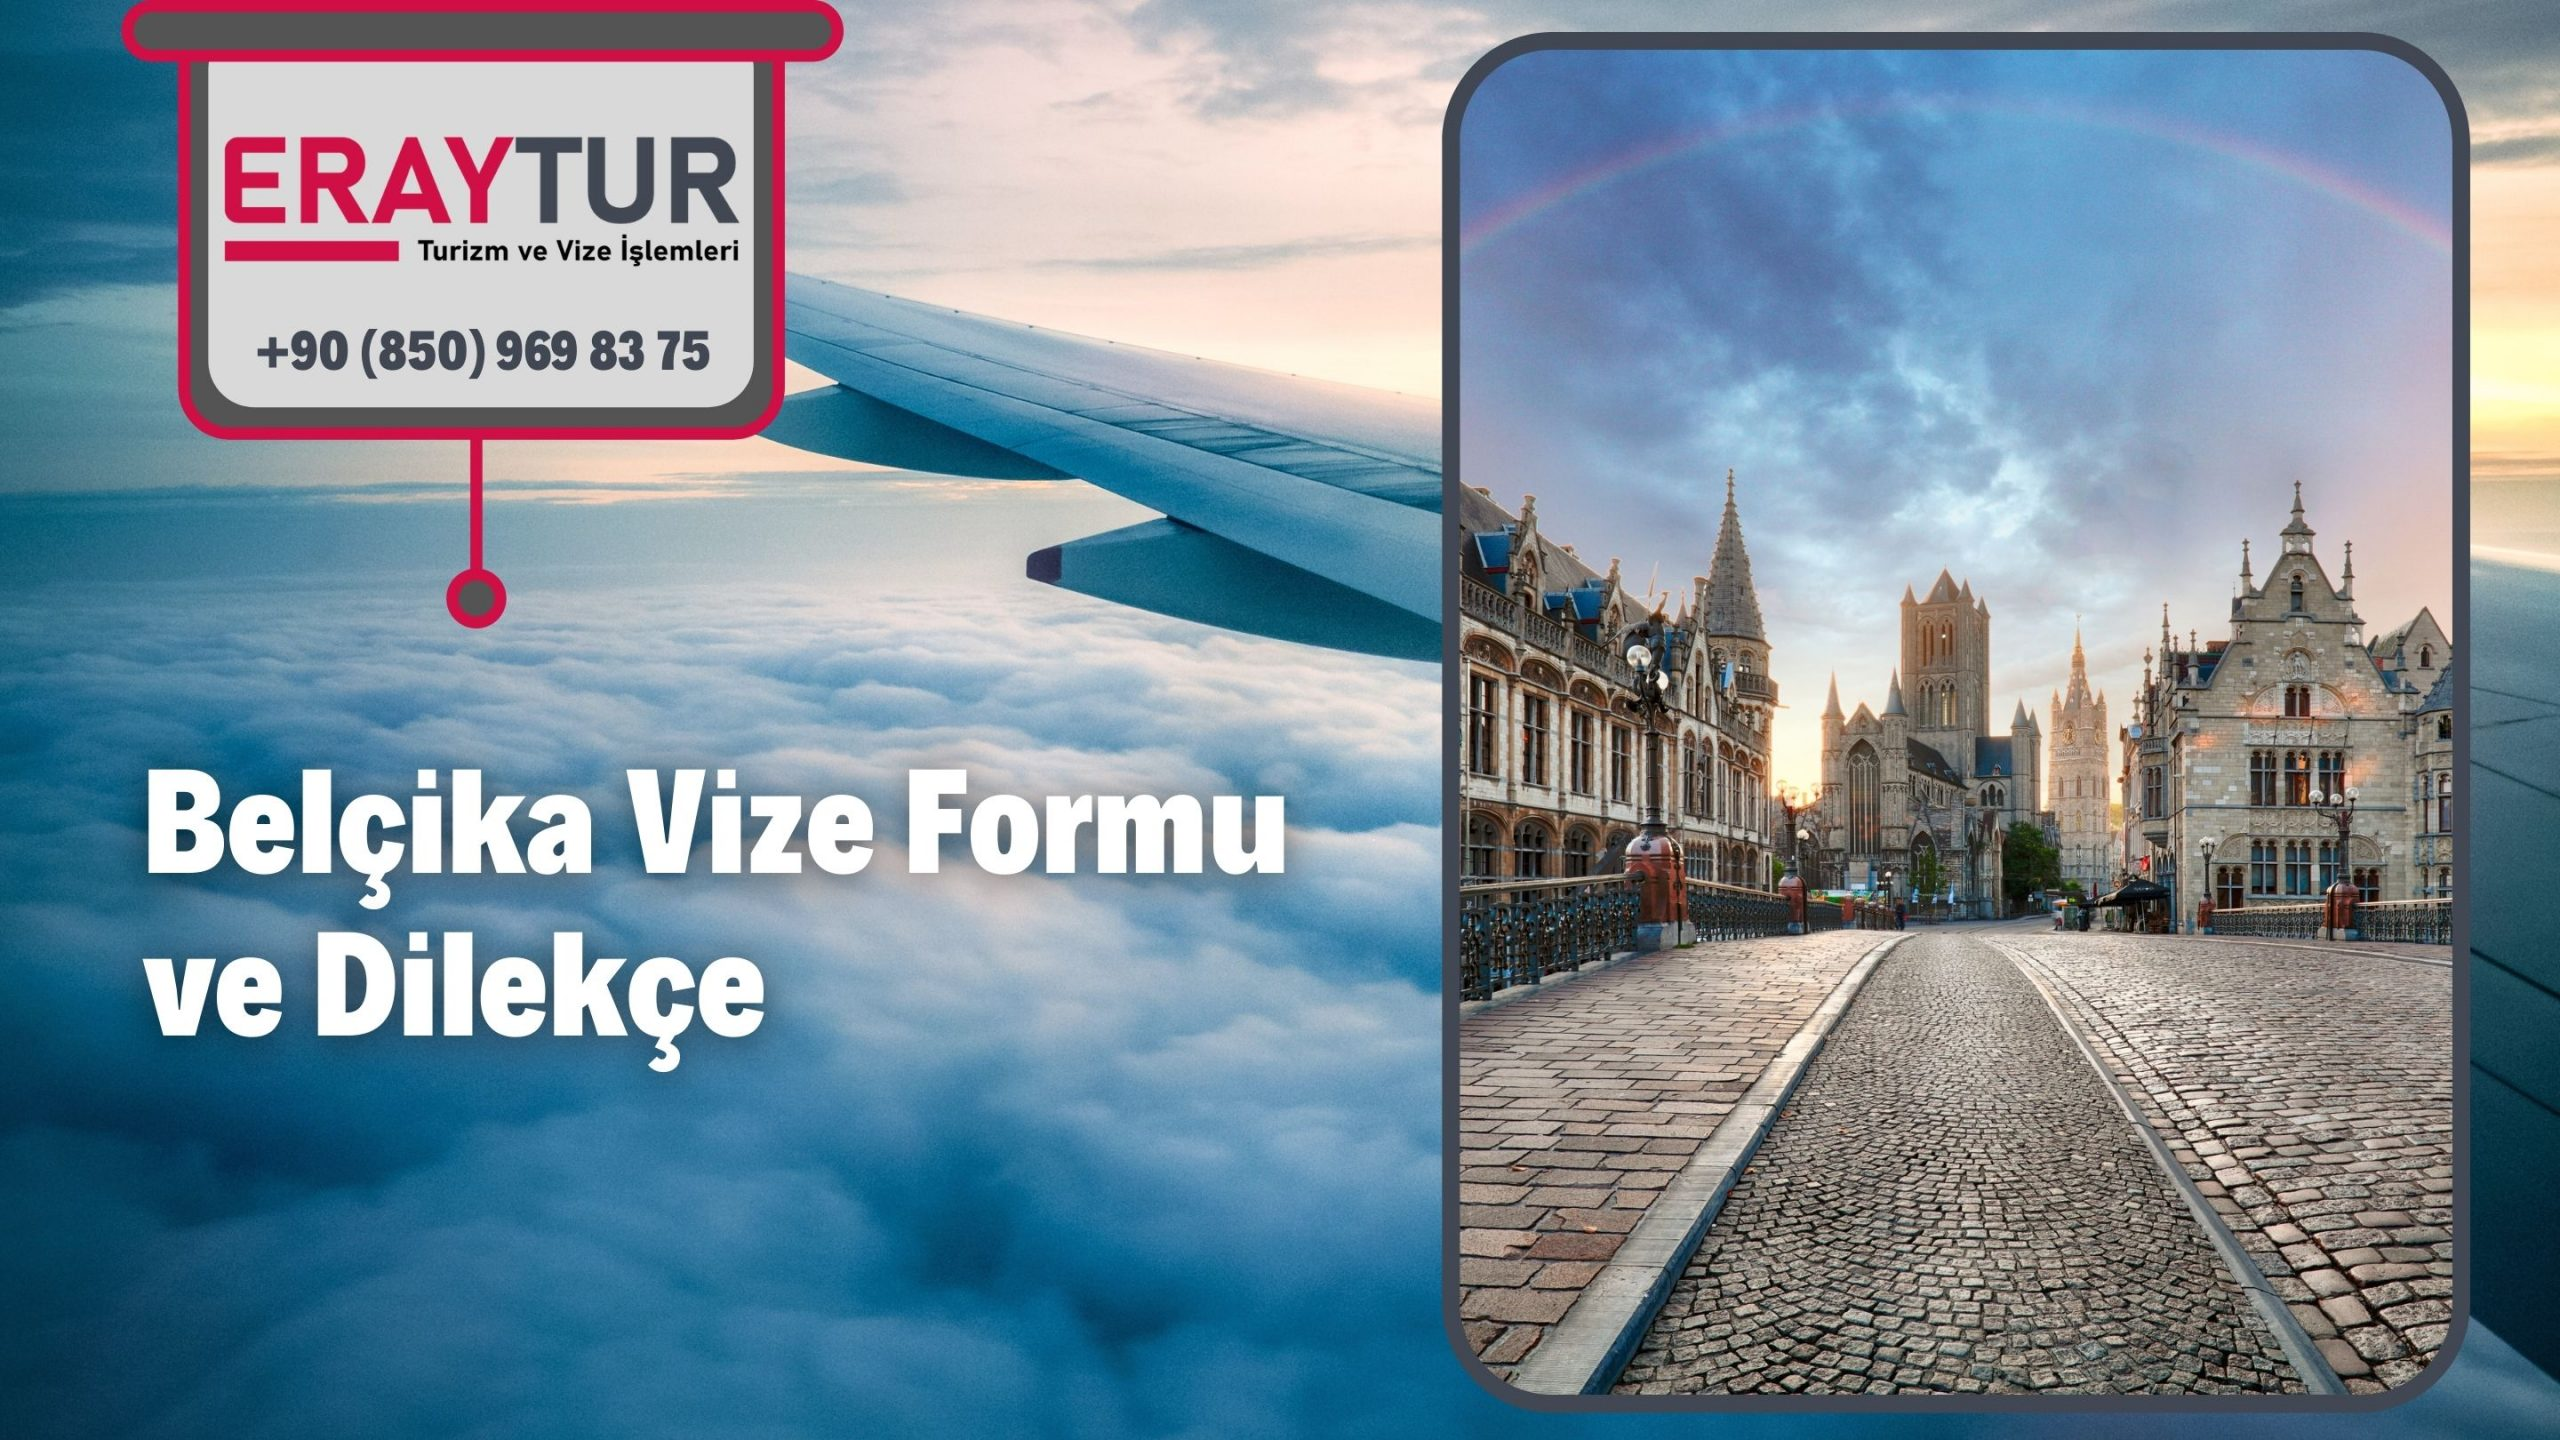 Belçika Vize Formu ve Dilekçe